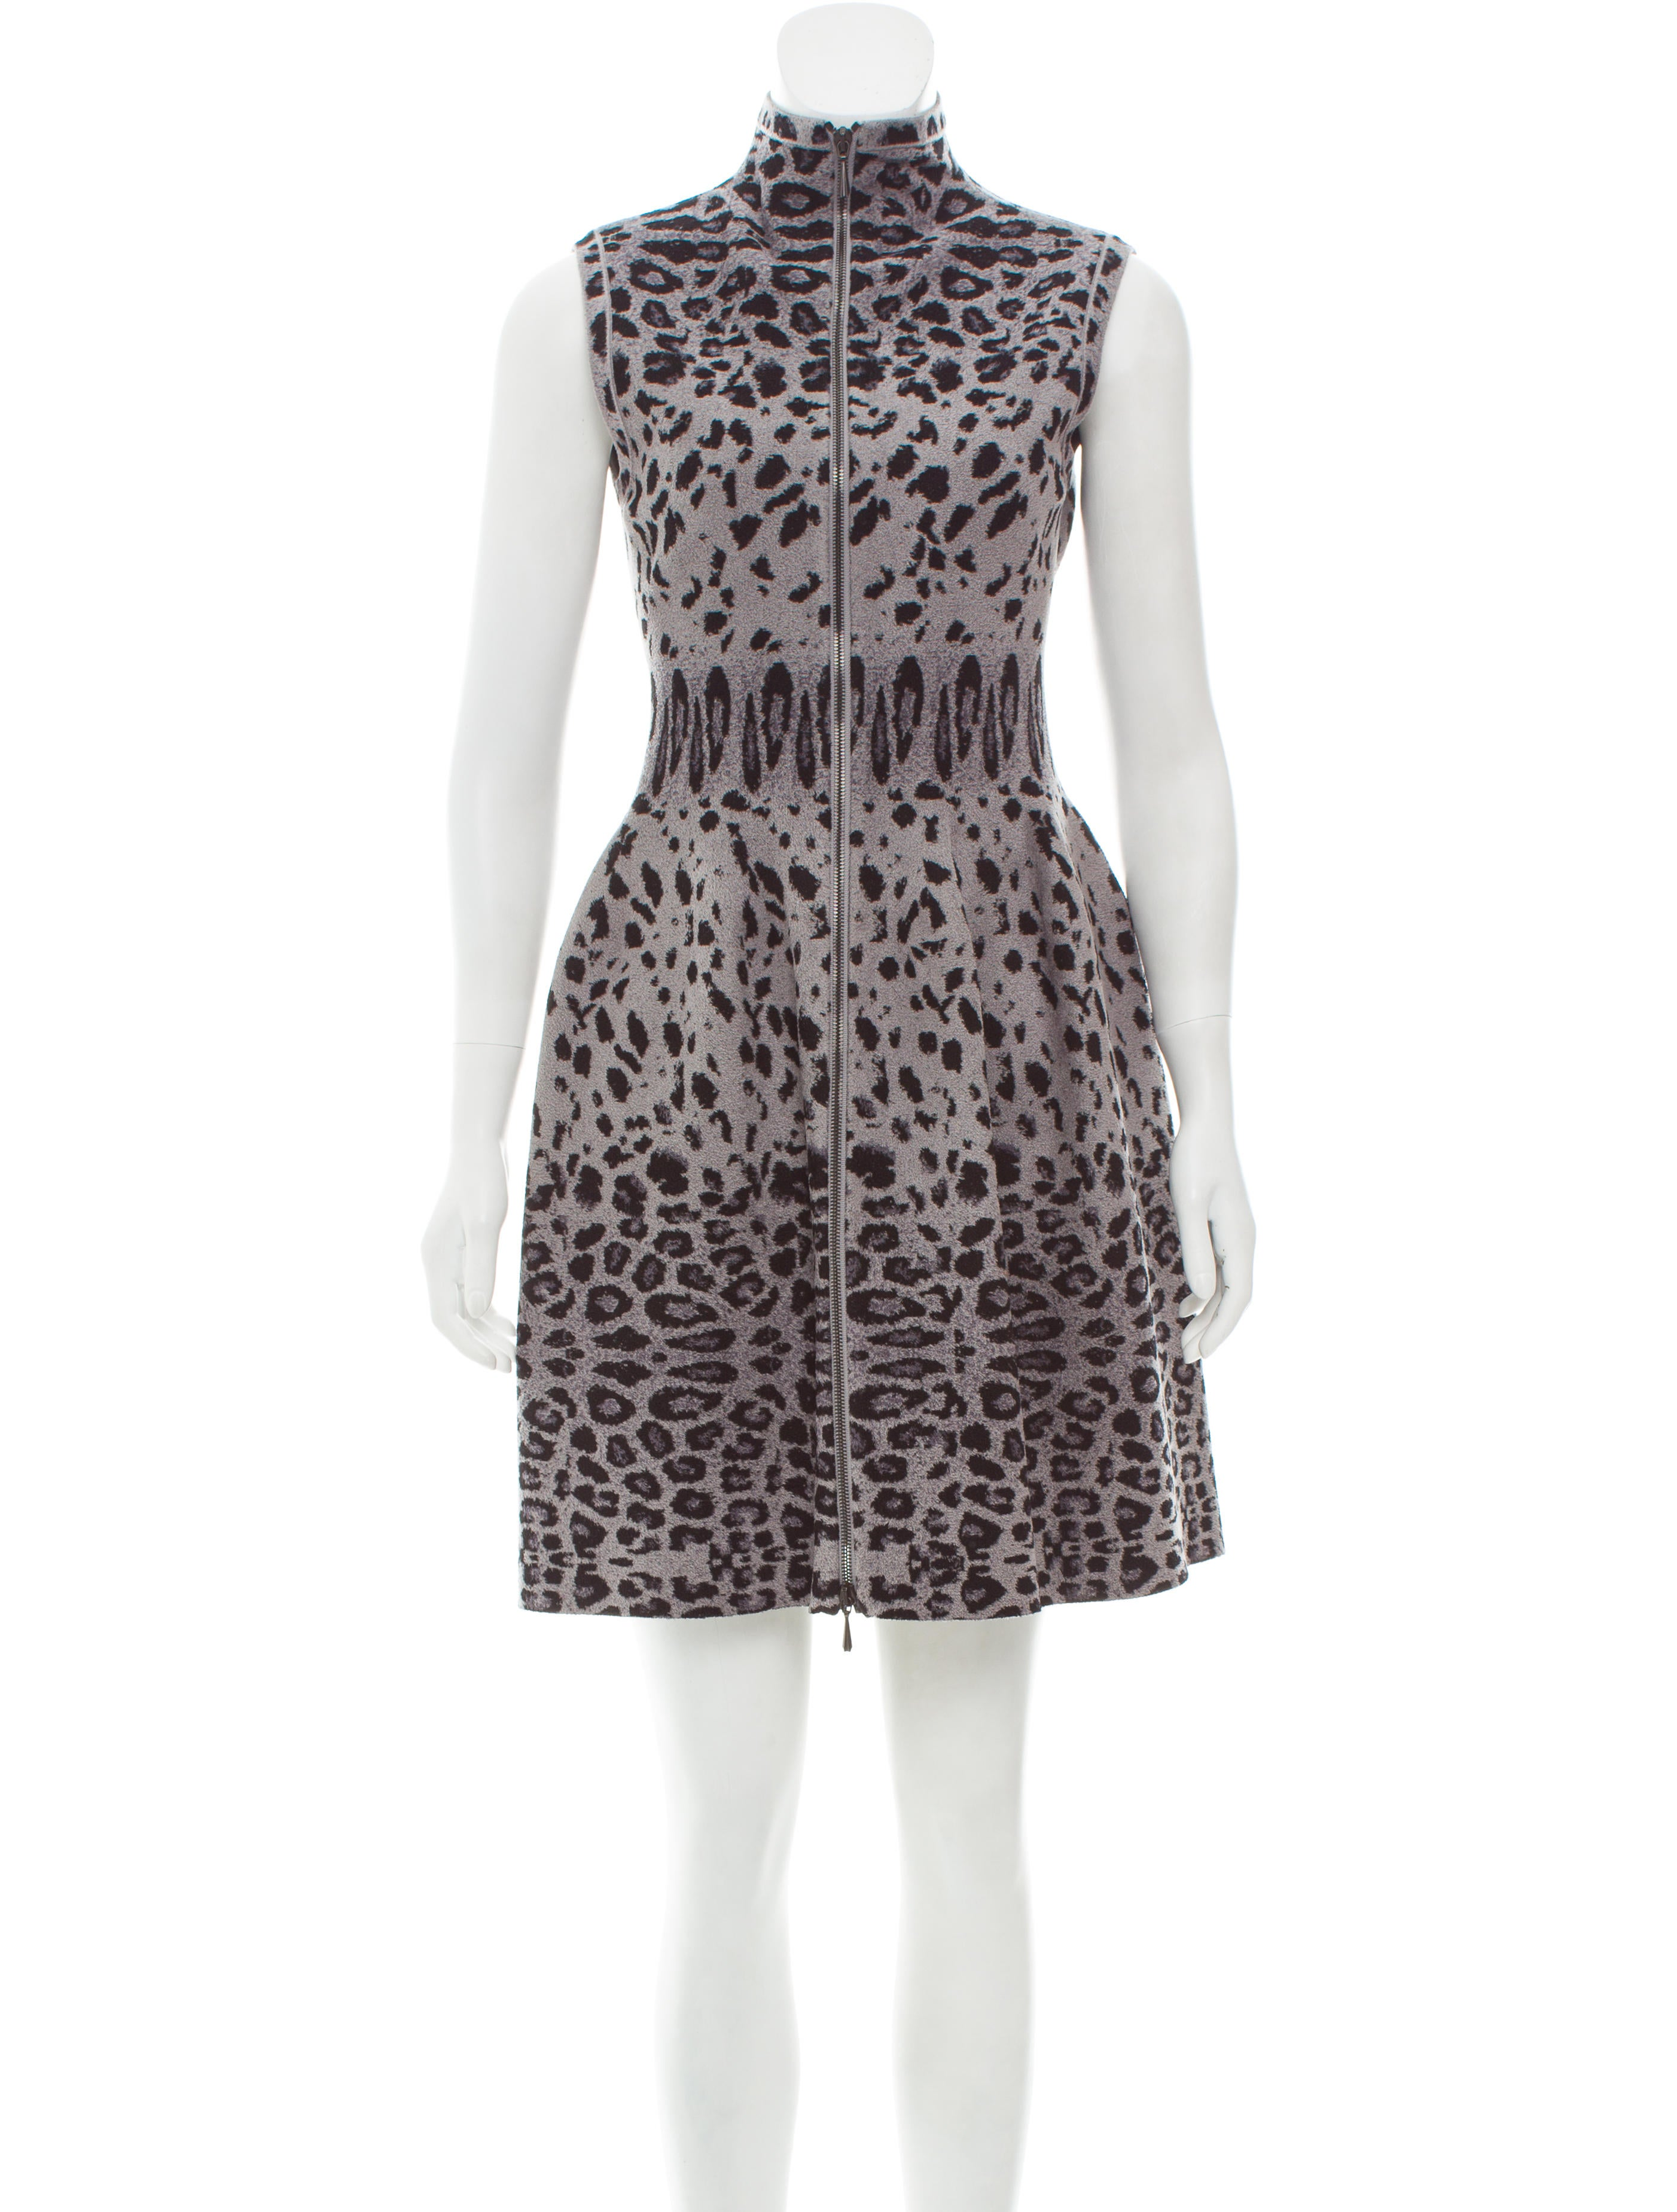 a33622234d3 Alaïa Leopard-Printed Fit and Flare Dress - Clothing - AL232366 ...